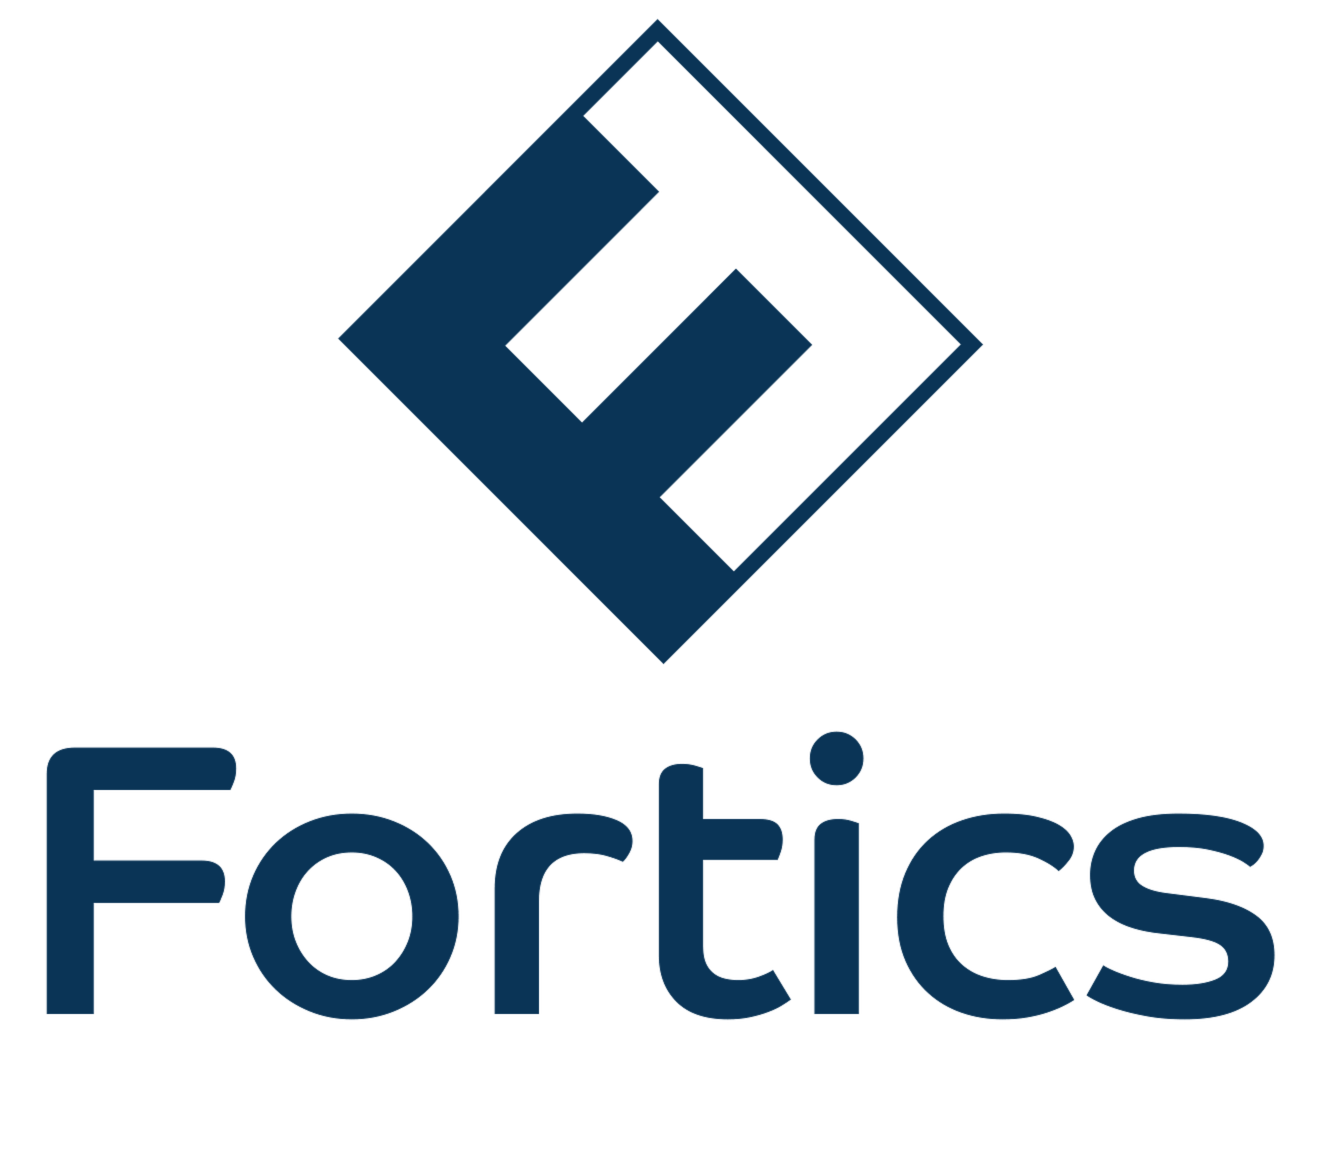 FORTICS TECNOLOGIA